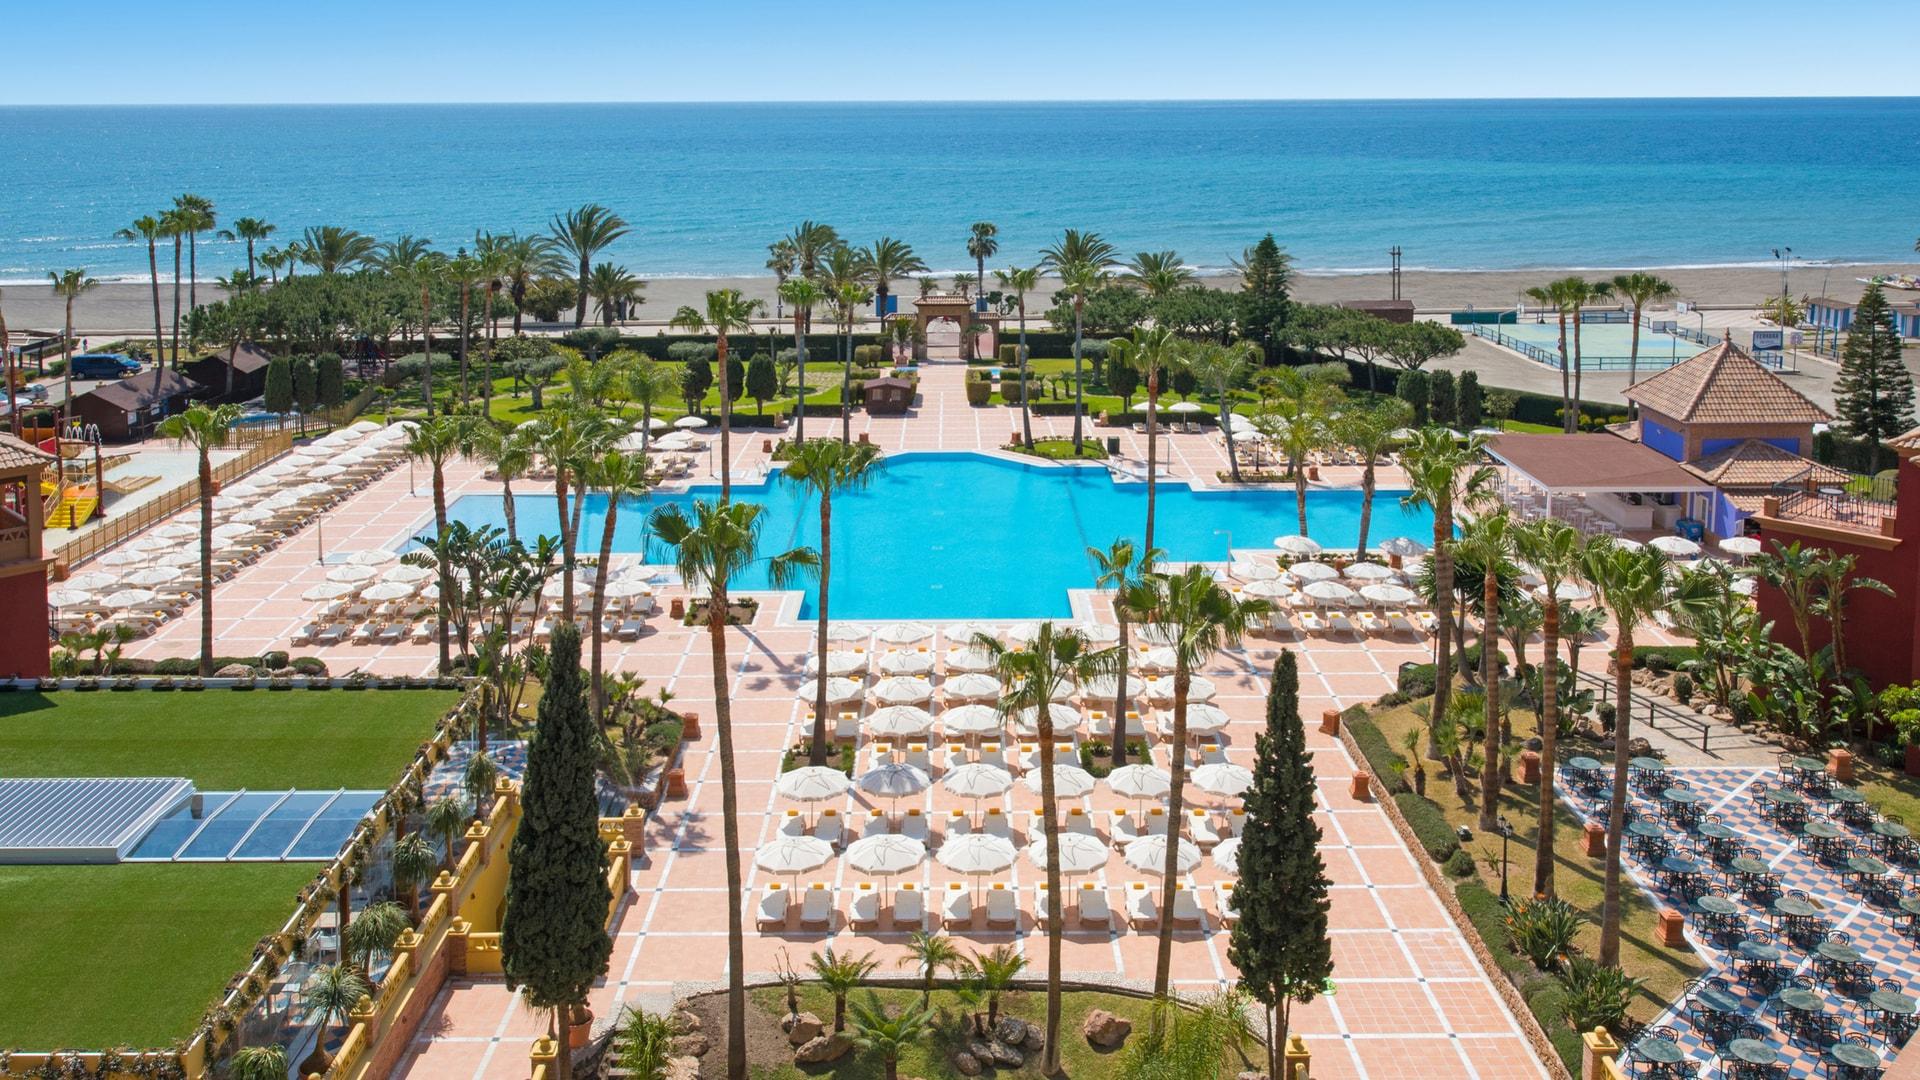 All-Inclusive Hotel In Malaga   Iberostar Malaga Playa pour Hotel Lisbonne Avec Piscine